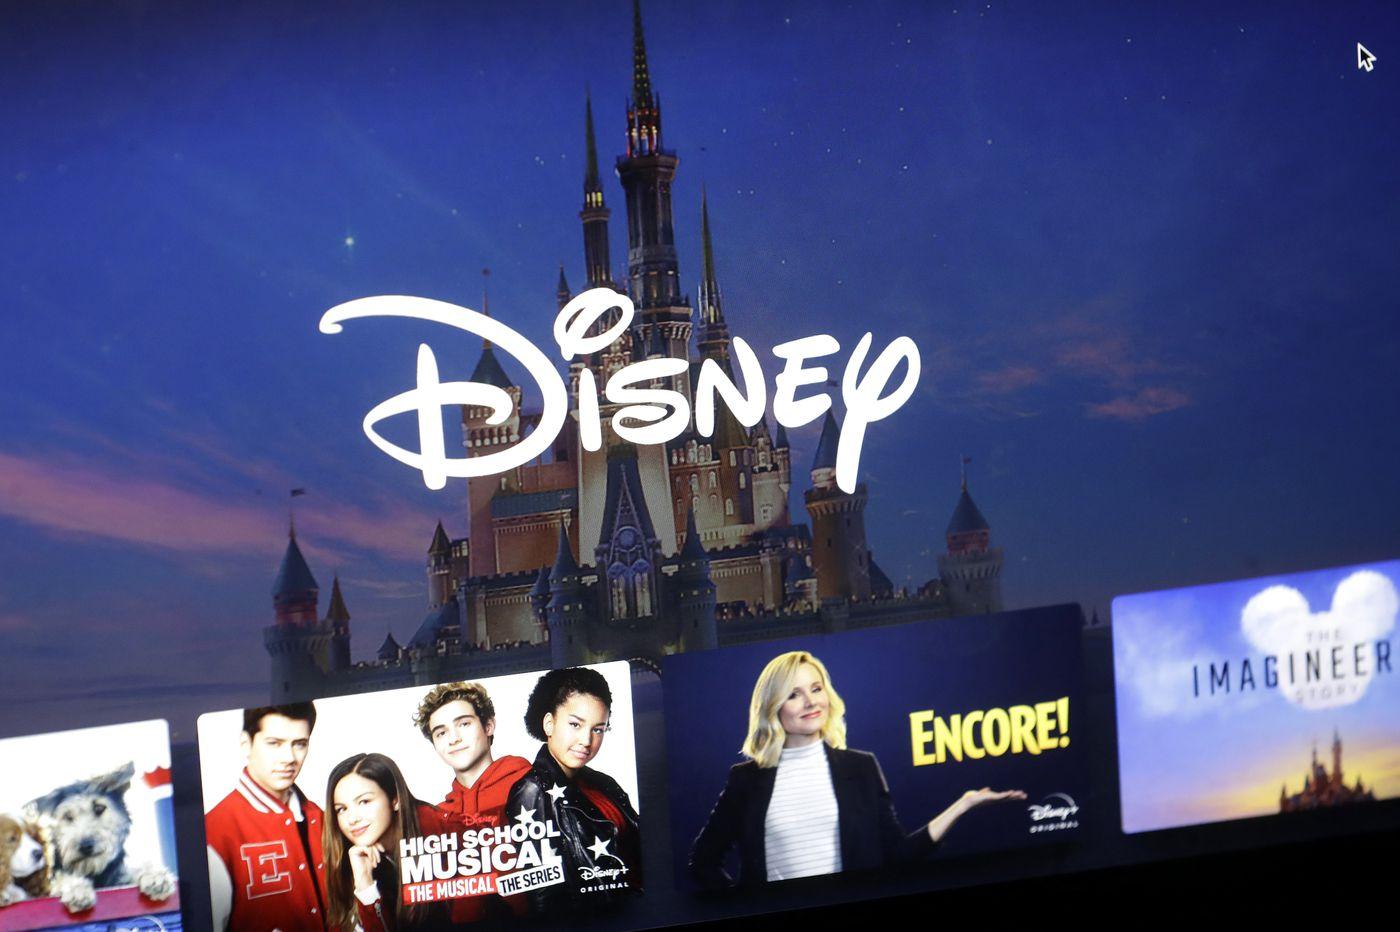 Disney+ user accounts already found on hacking sites